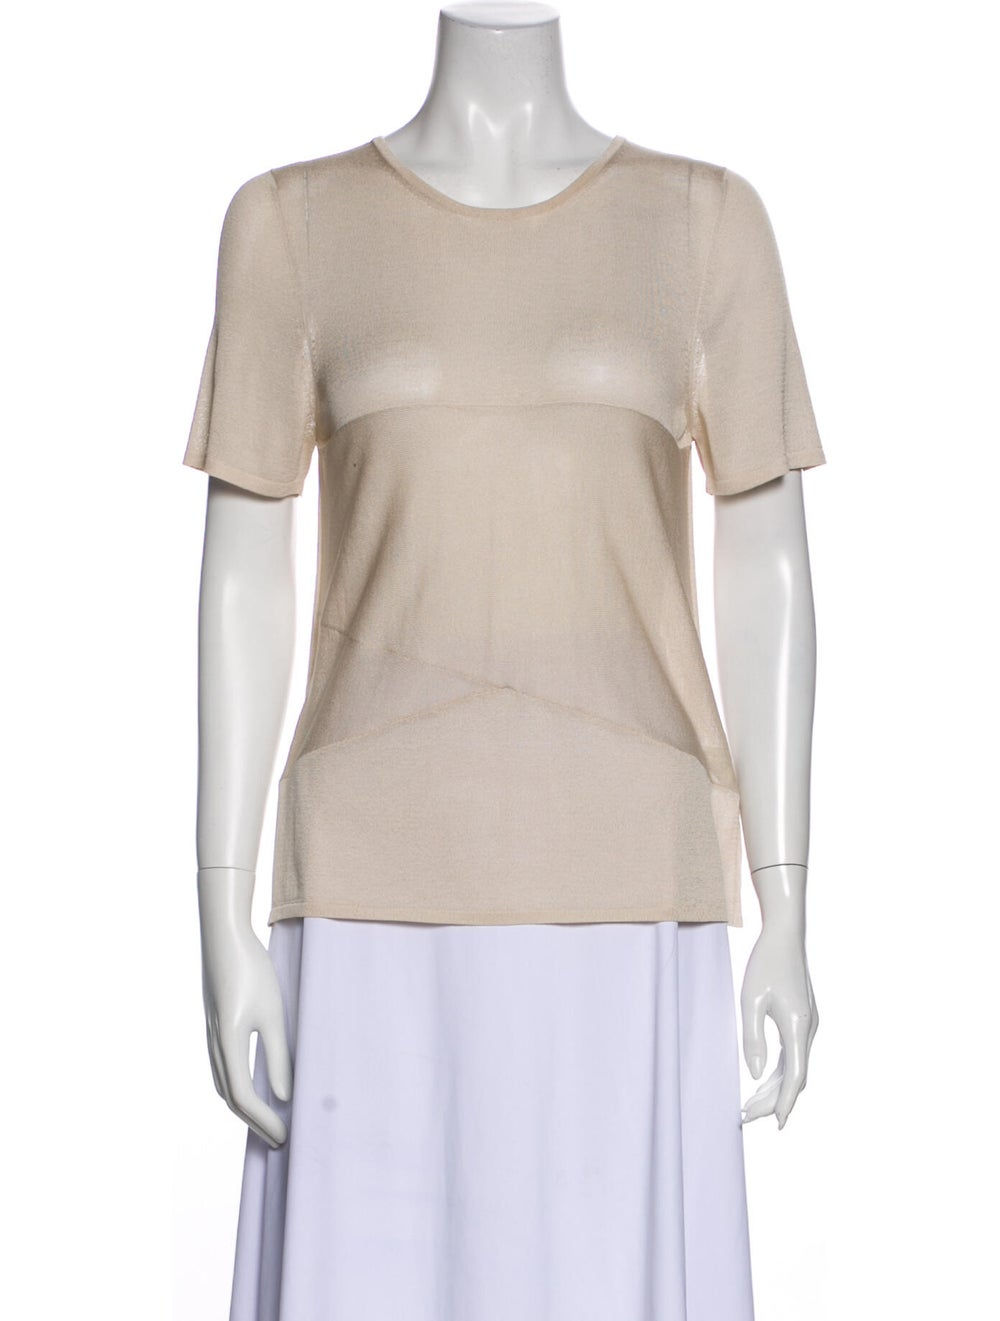 Gucci Vintage Silk T-Shirt - image 1